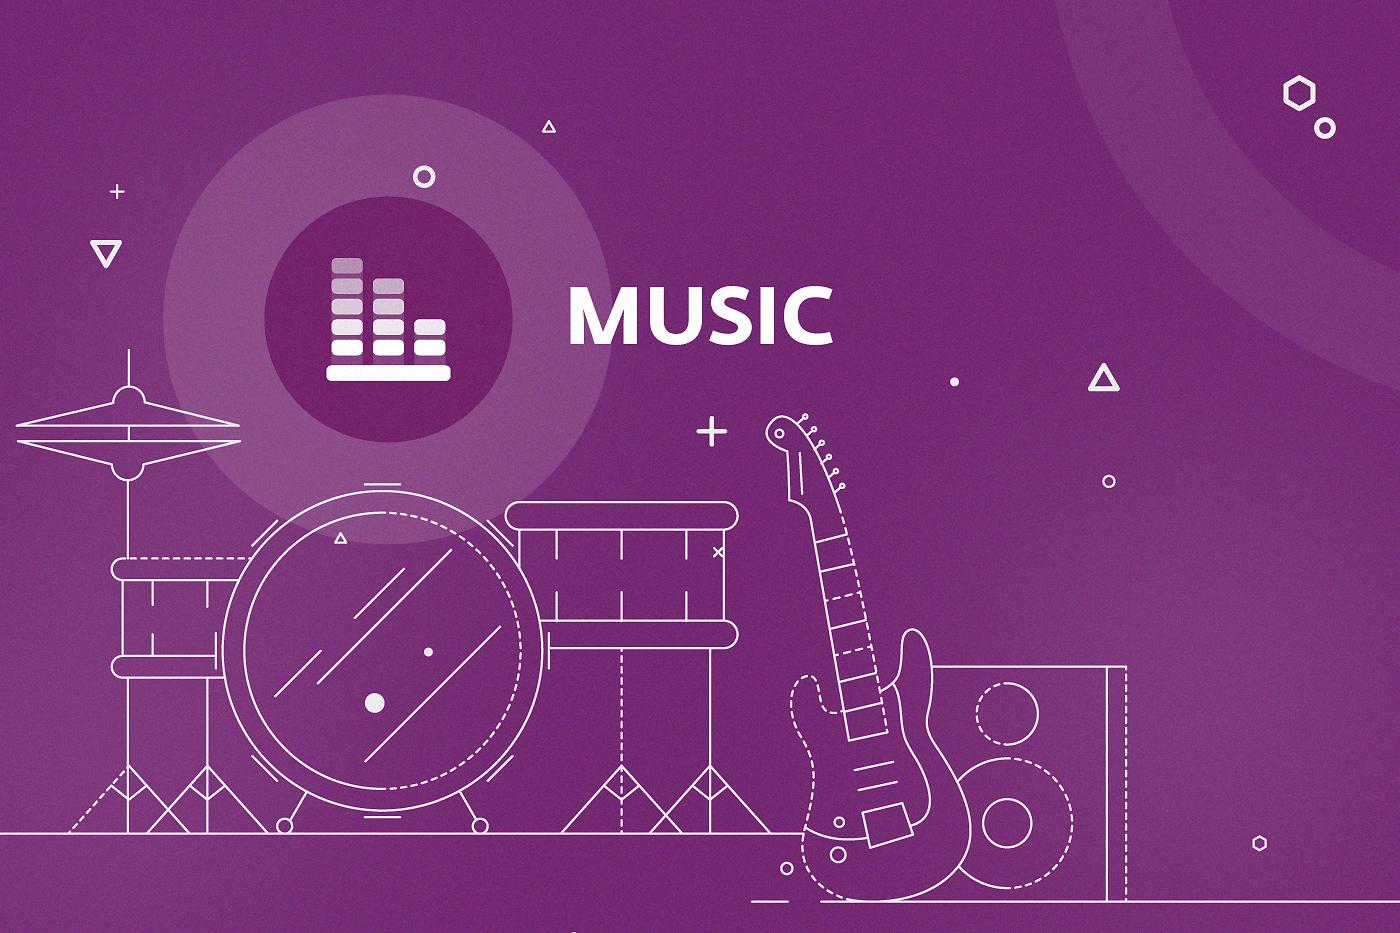 music eng - Music